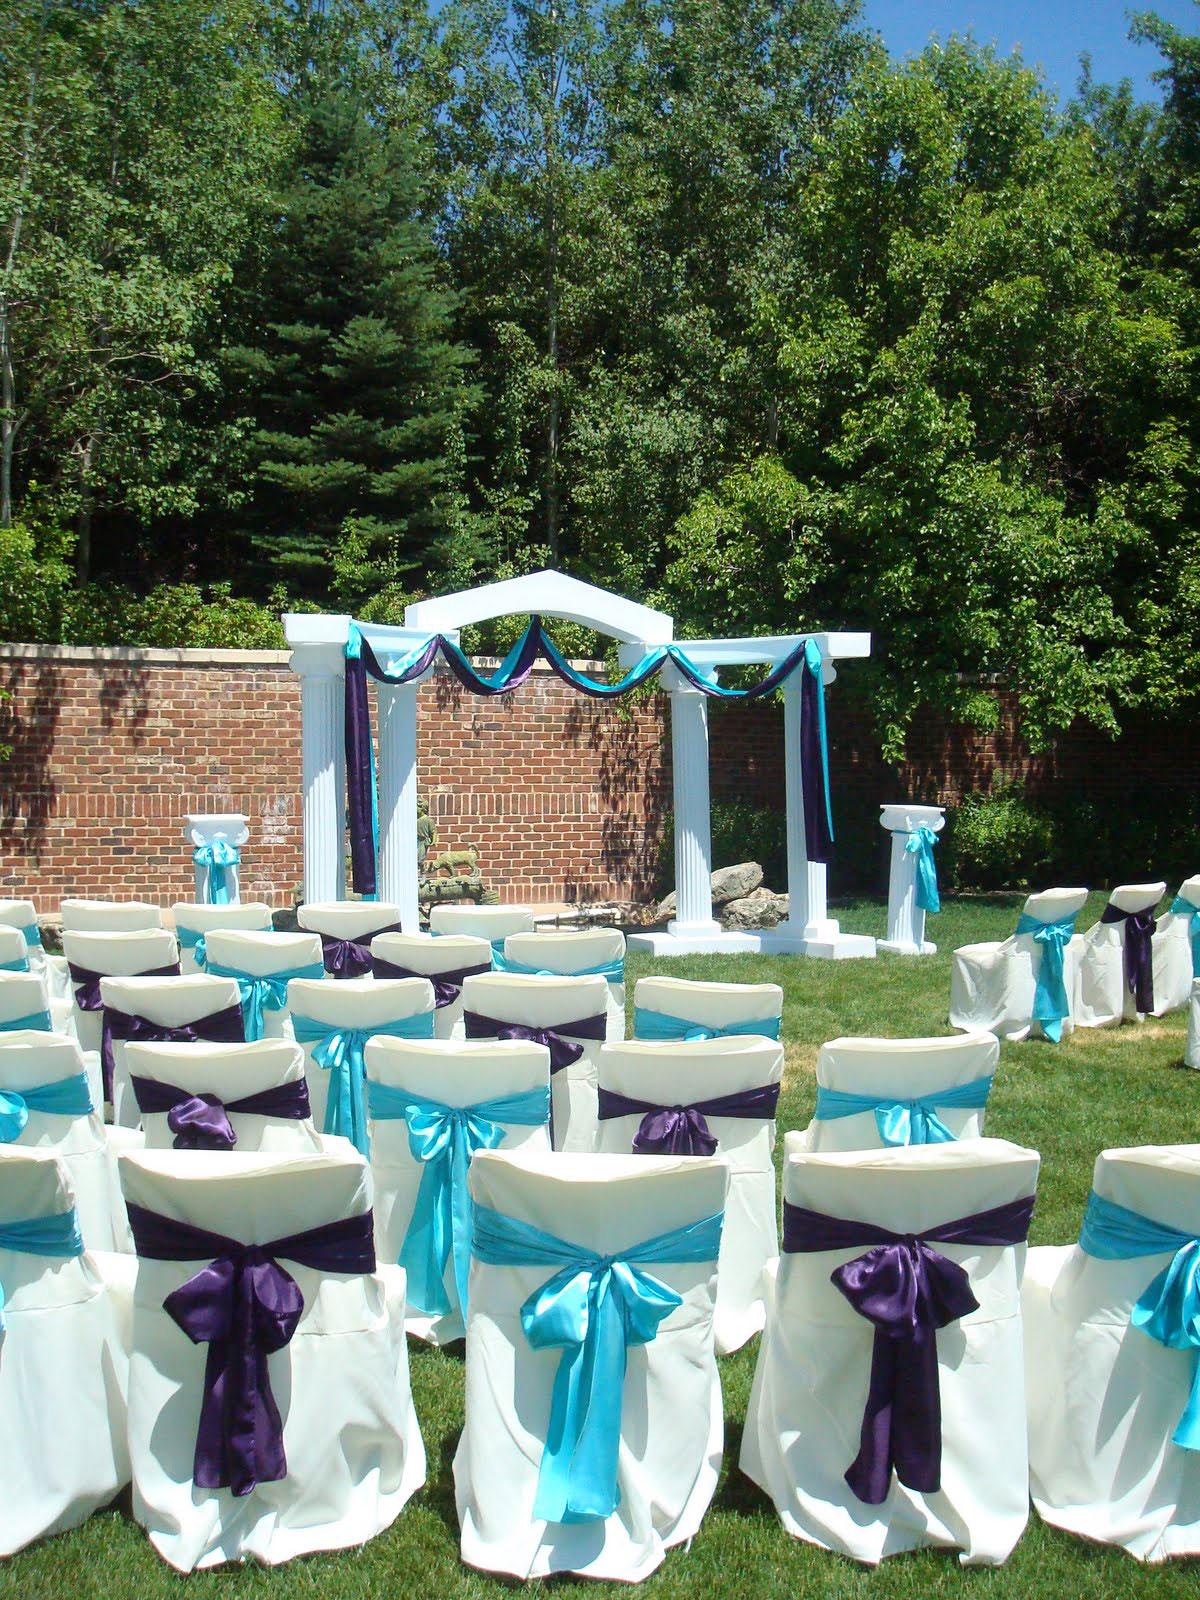 2017 Wedding Trends -Top 12 Greenery Wedding Decoration Ideas